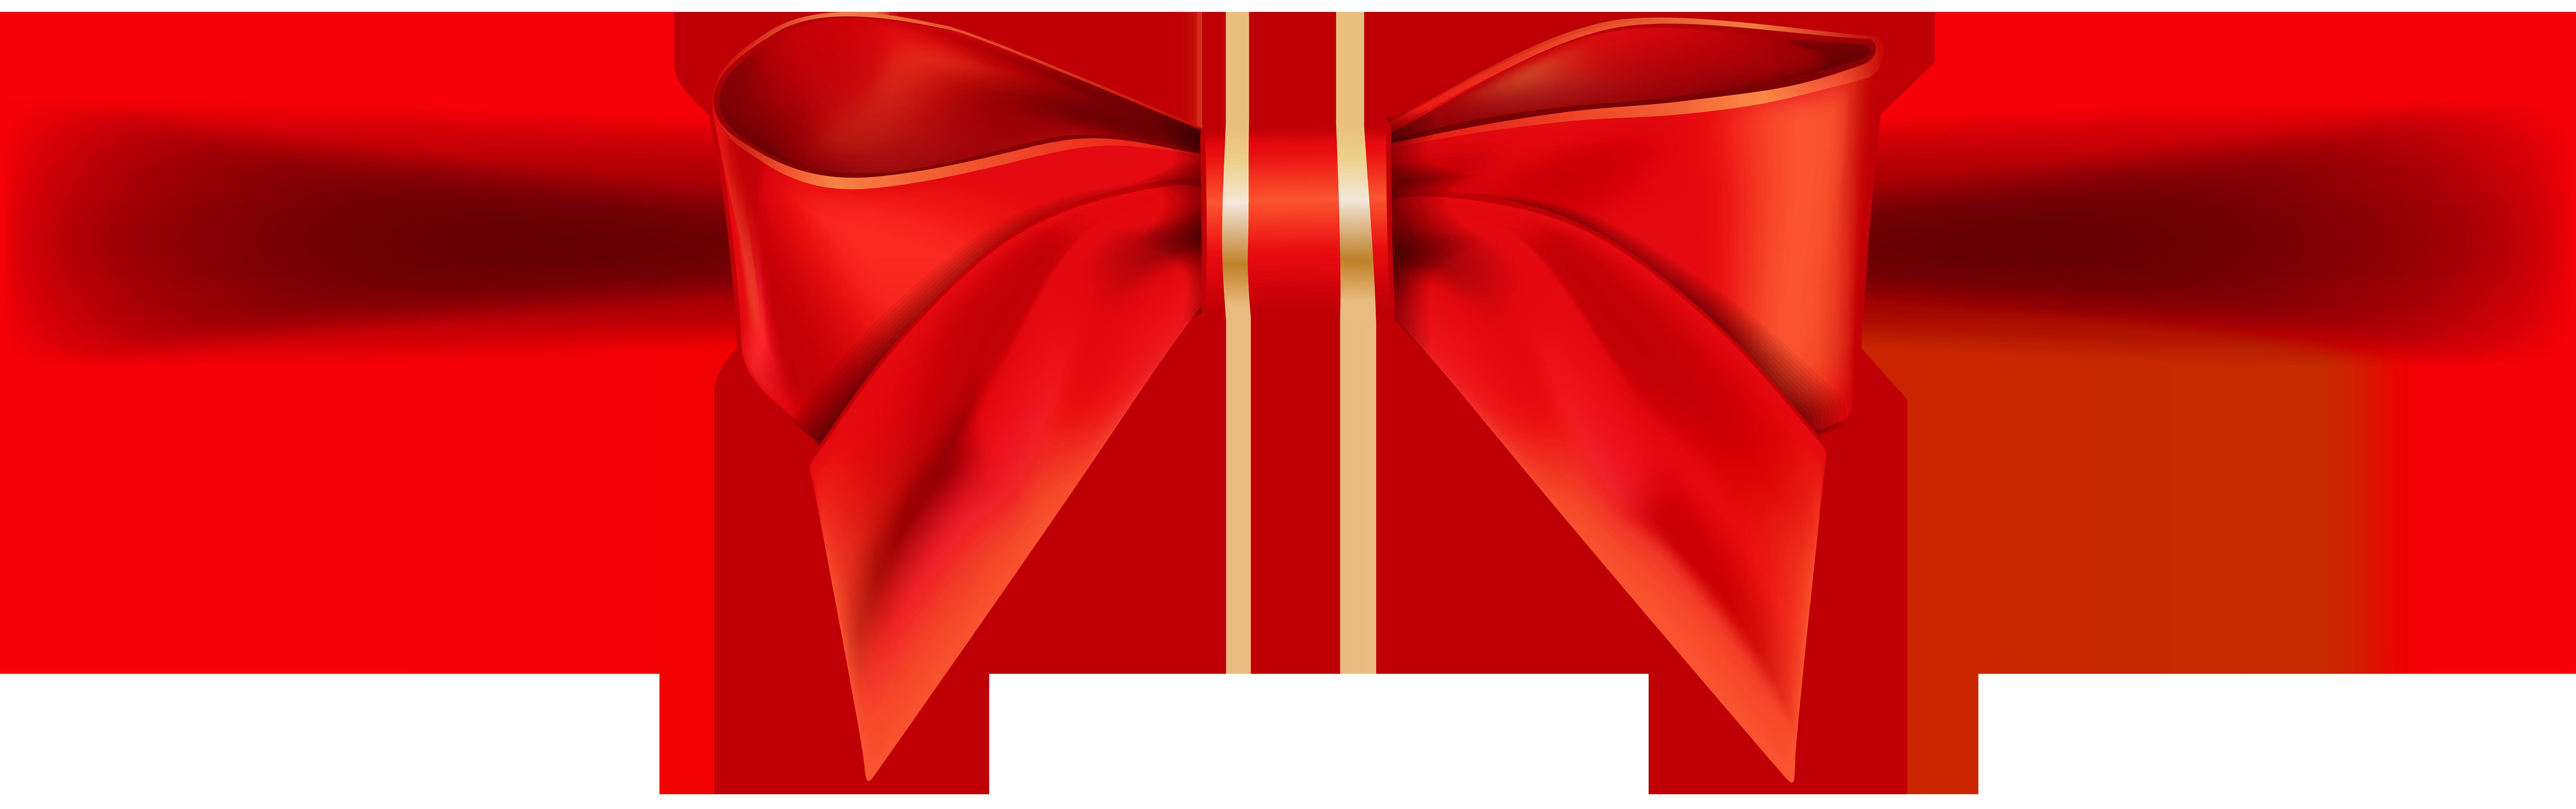 Red bow transparent png. Princess clipart ribbon